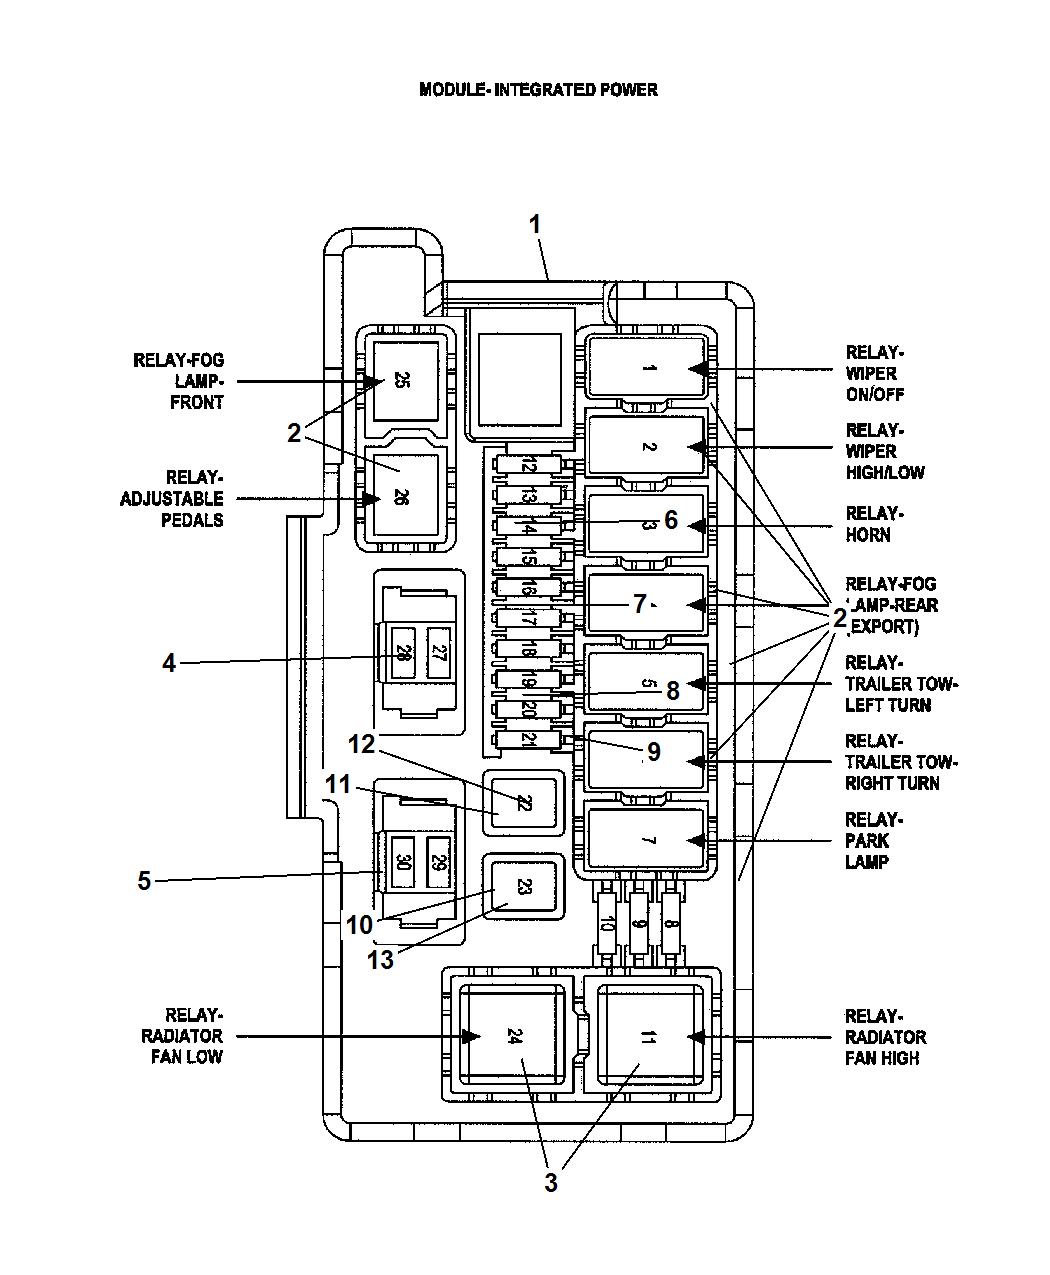 2006 jeep commander fuse panel diagram - wiring diagram base central-a -  central-a.jabstudio.it  jab studio